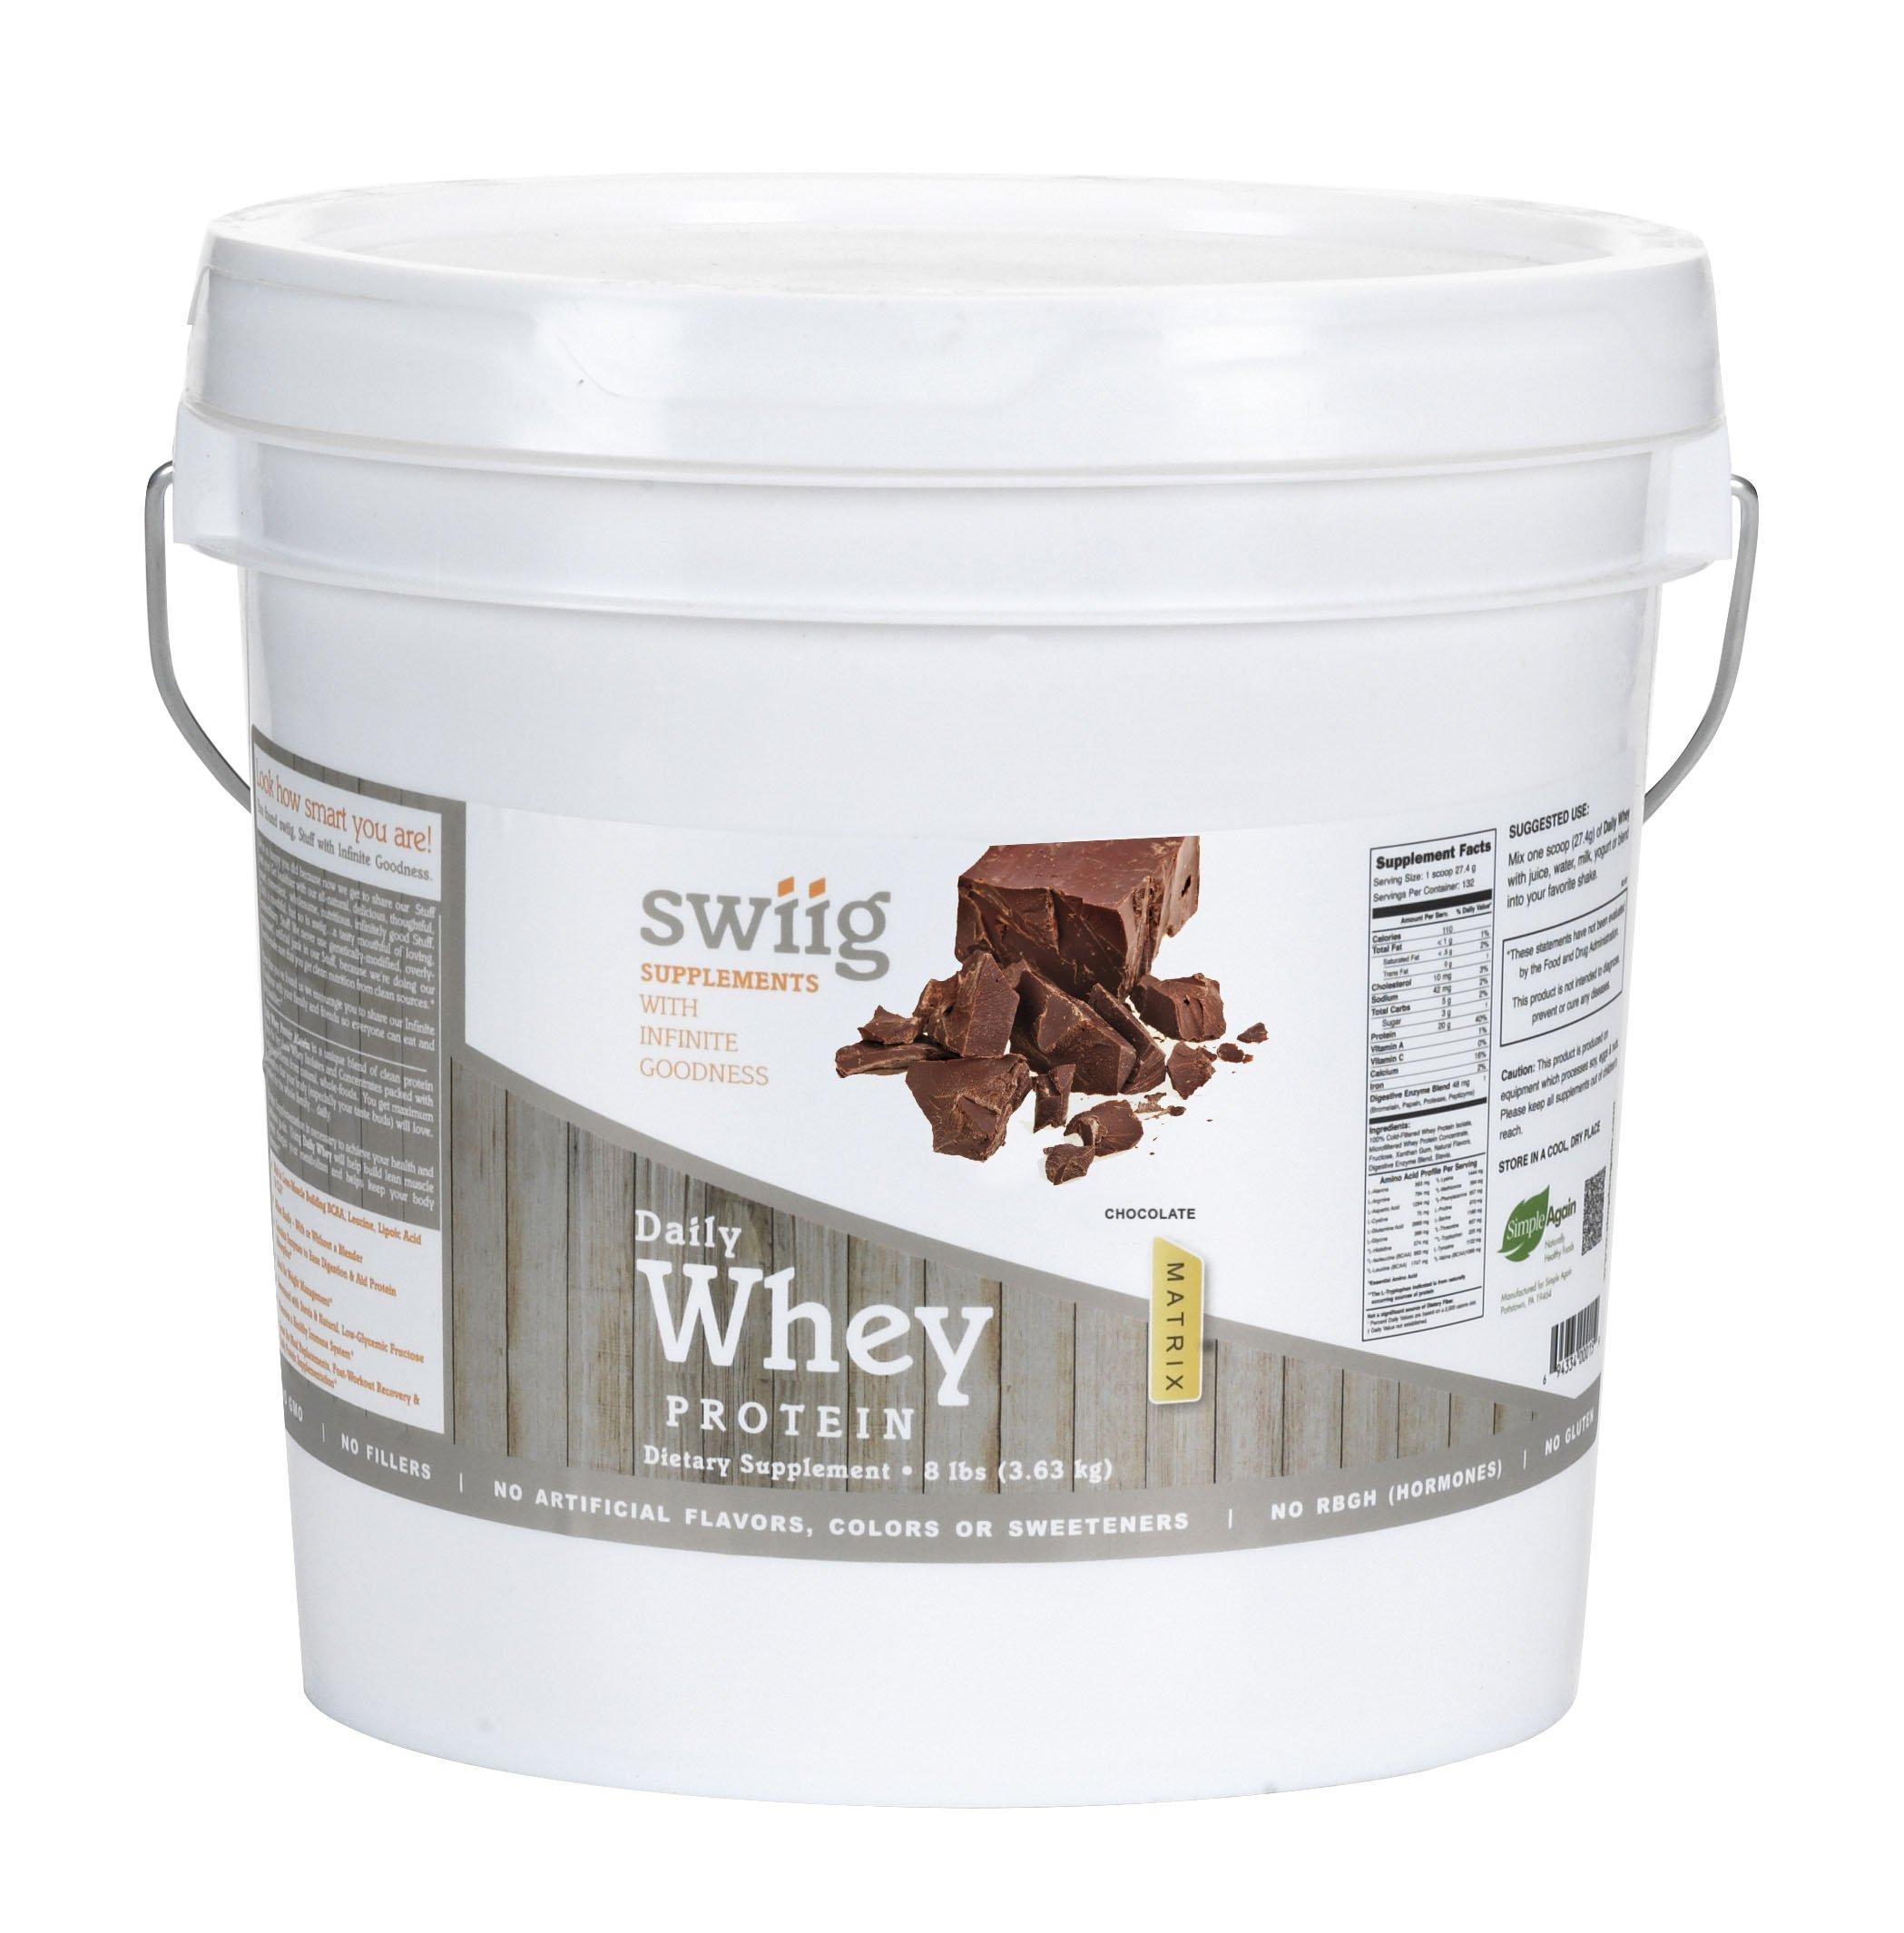 swiig Chocolate Whey Protein Matrix 8 lbs